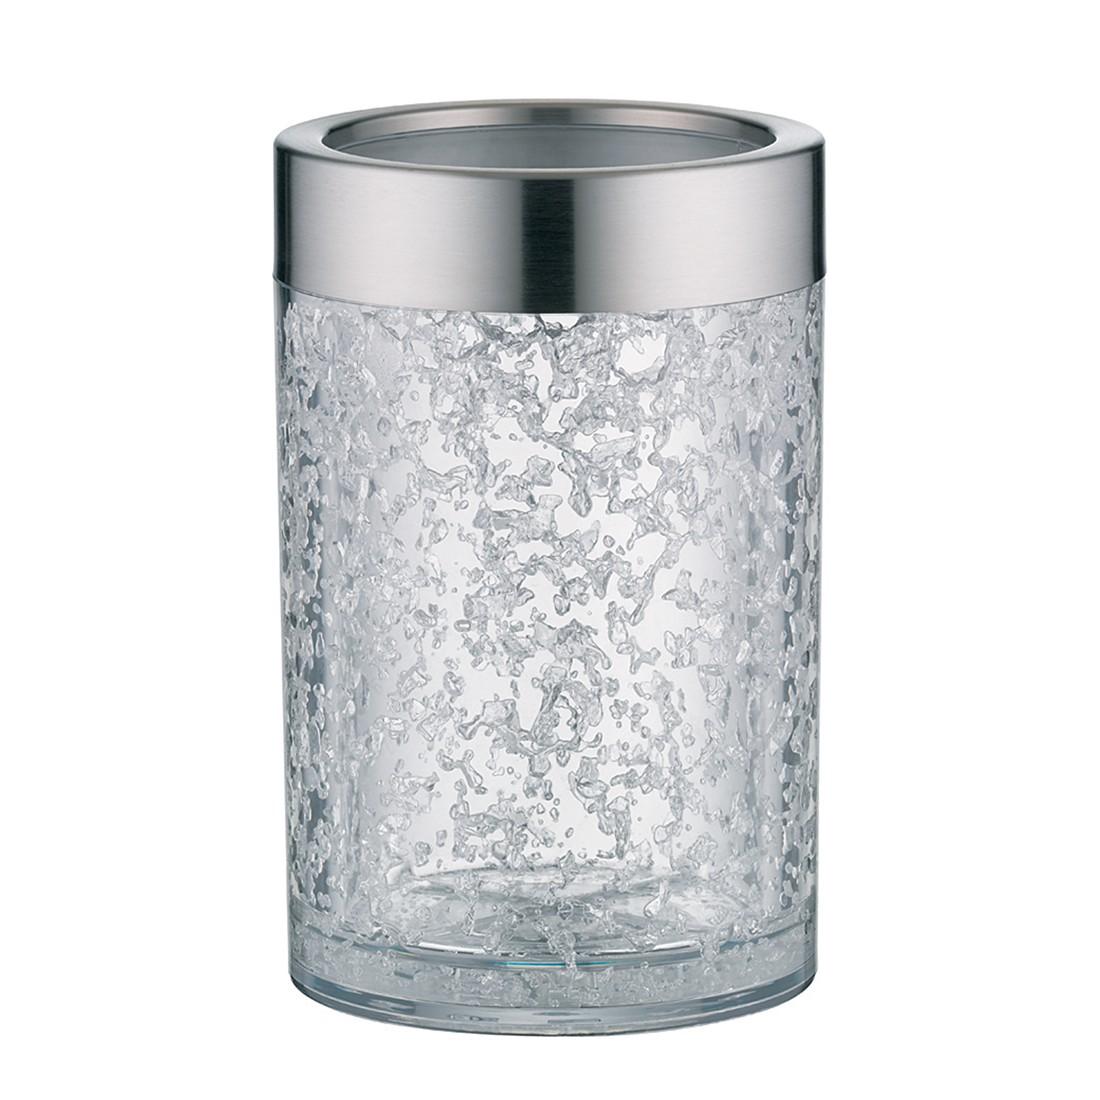 Aktiv-Flaschenkühler Crystal – Ice, Alfi günstig kaufen